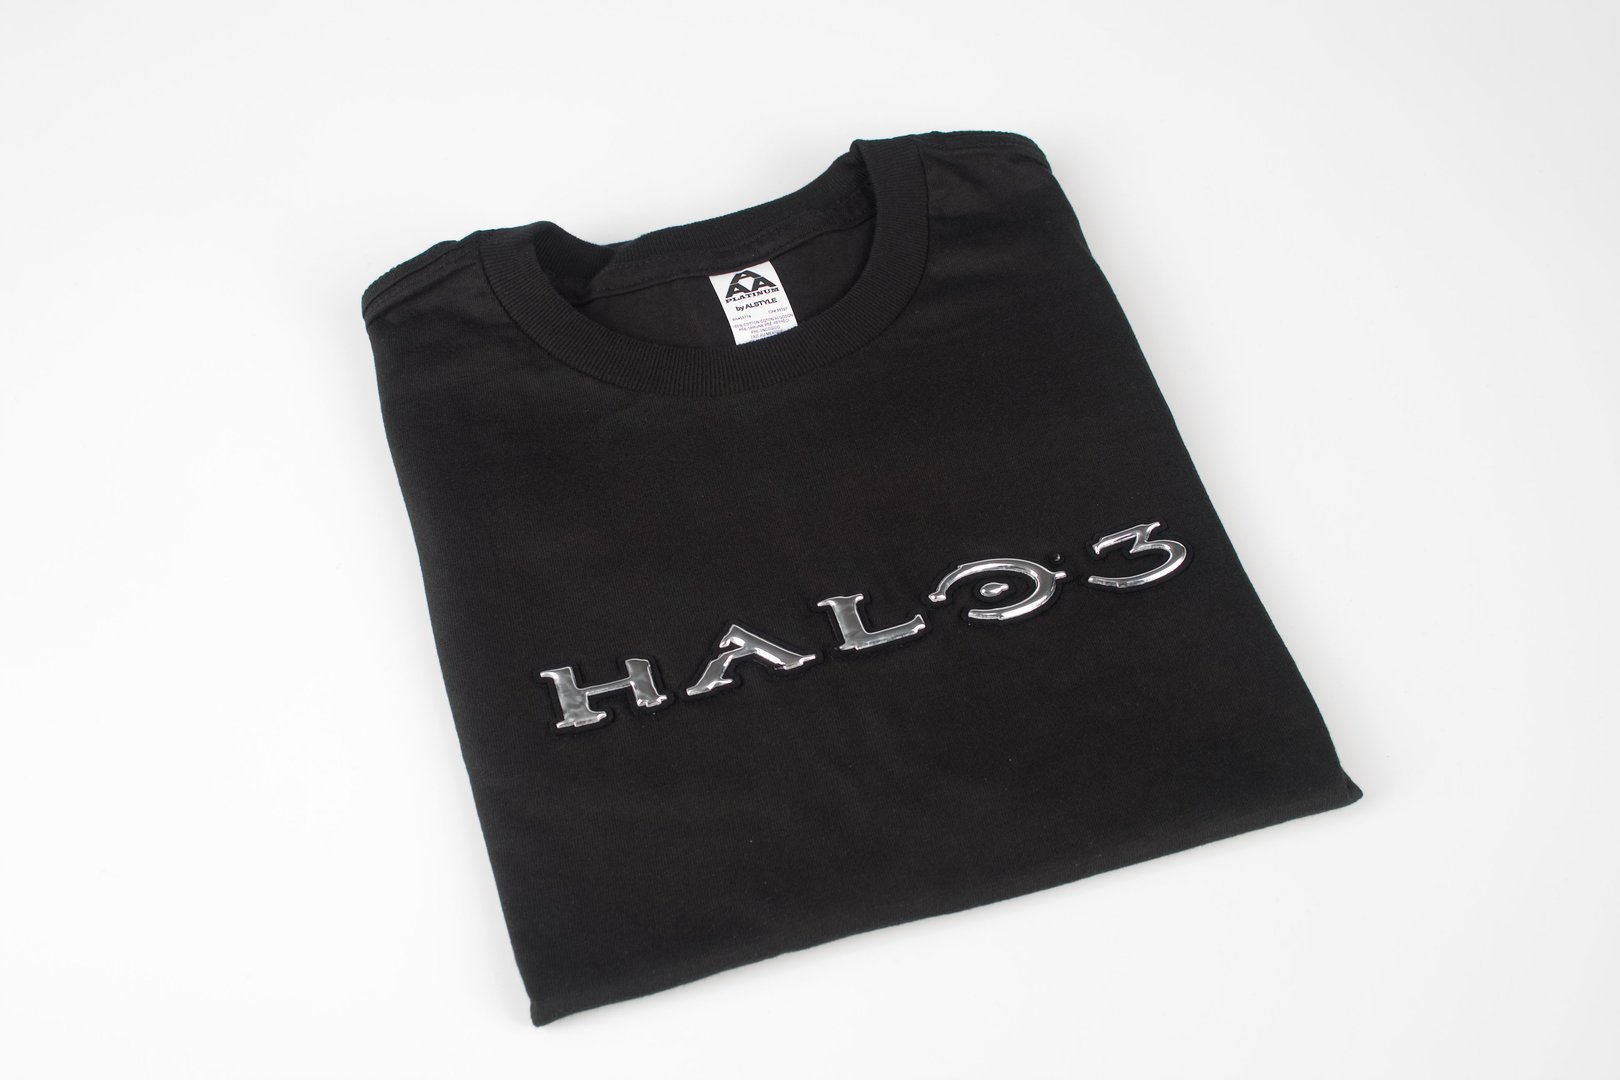 Halo 3 T-Shirt